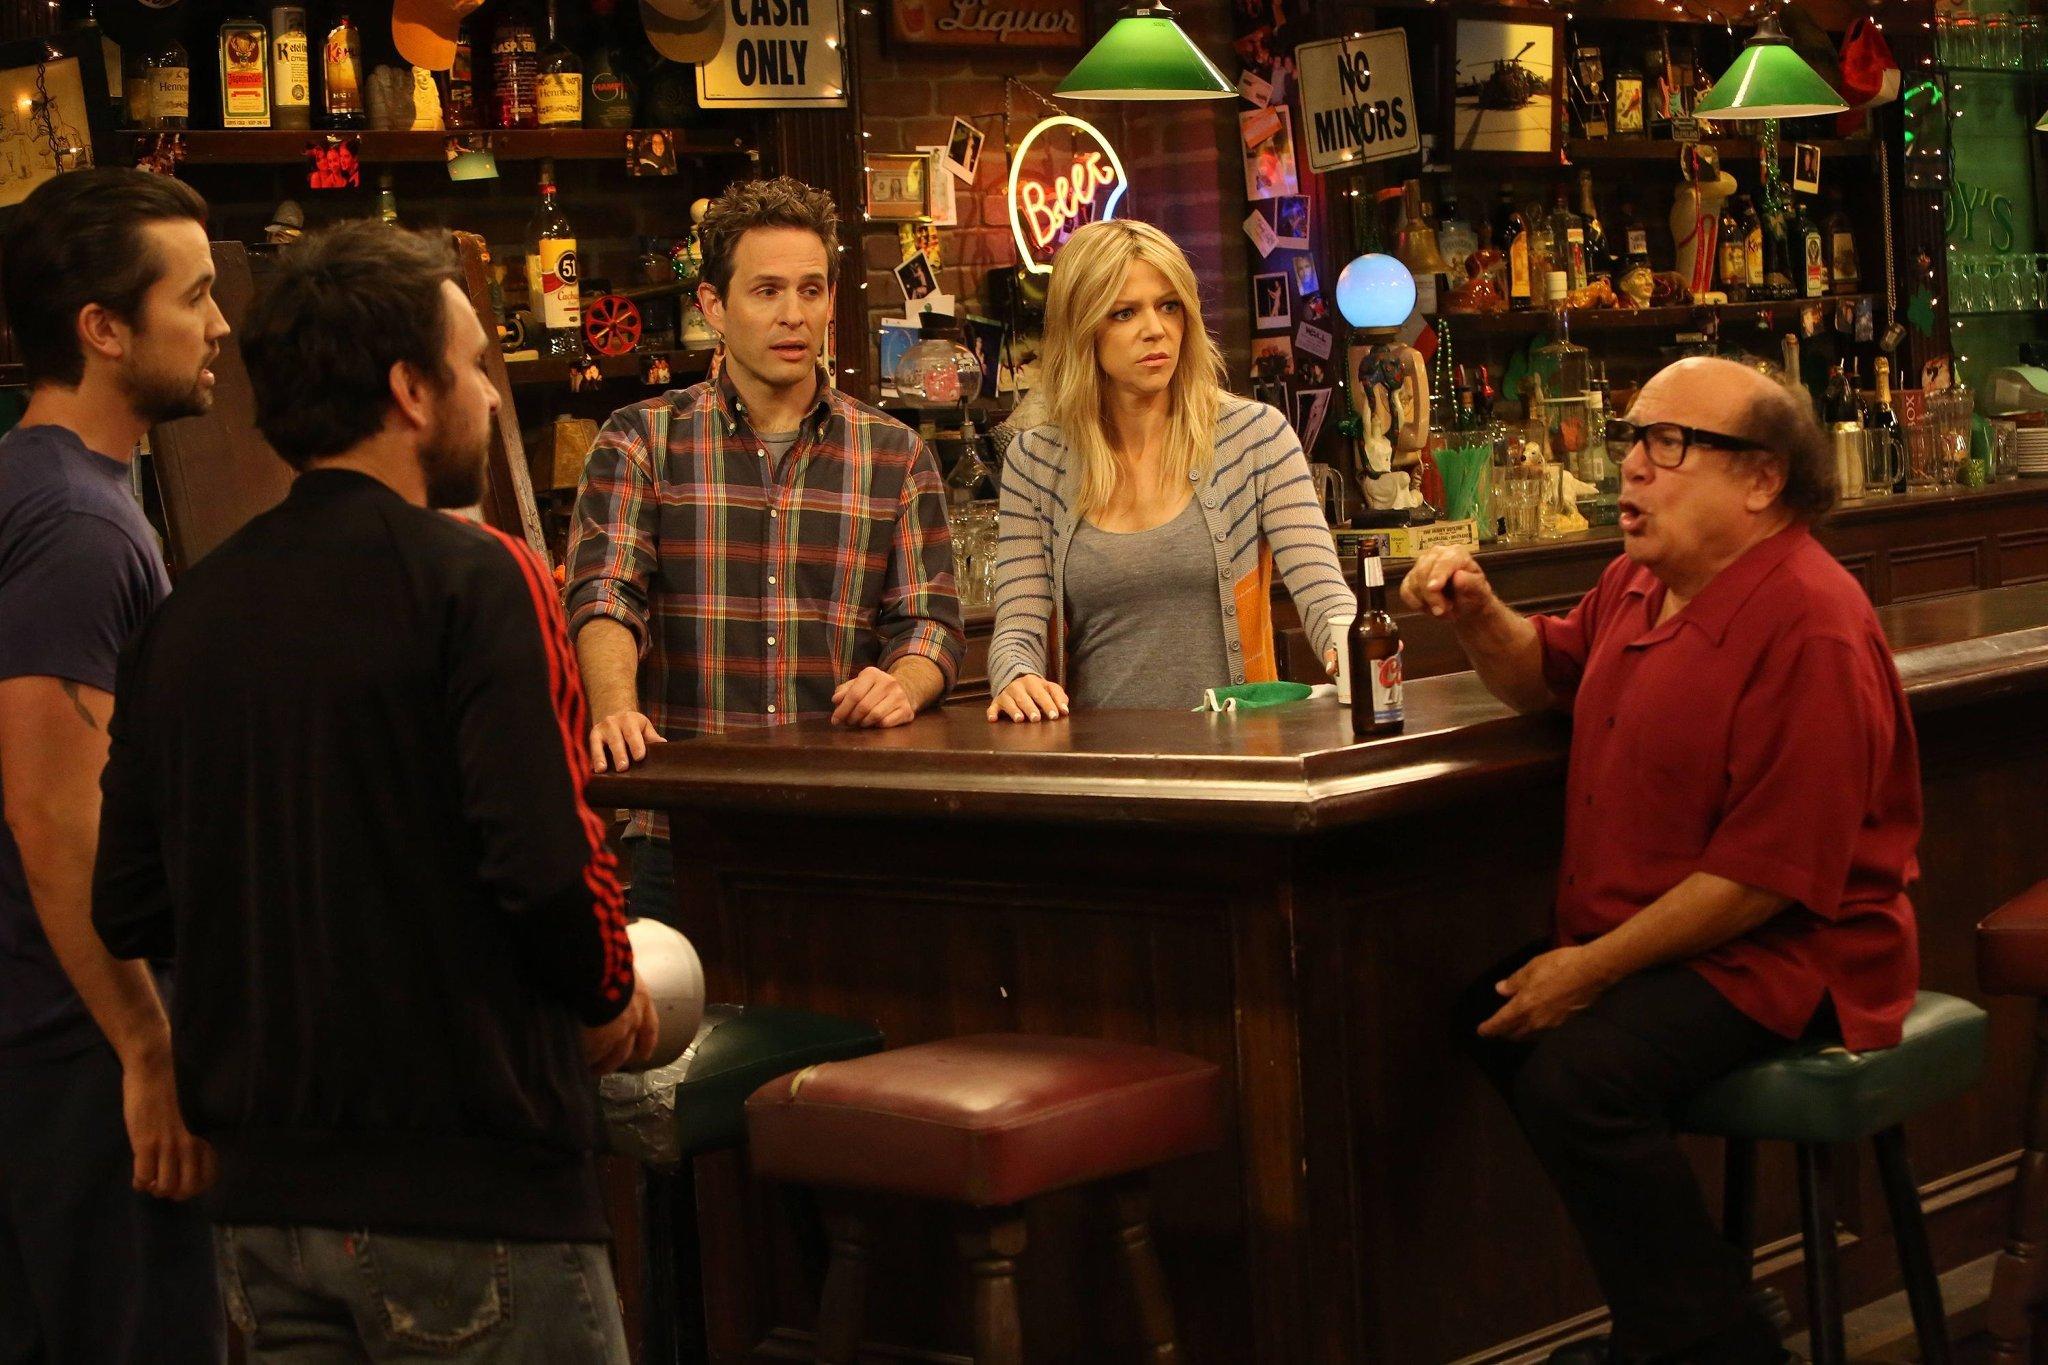 'It's Always Sunny in Philadelphia' Season 15 Set Image